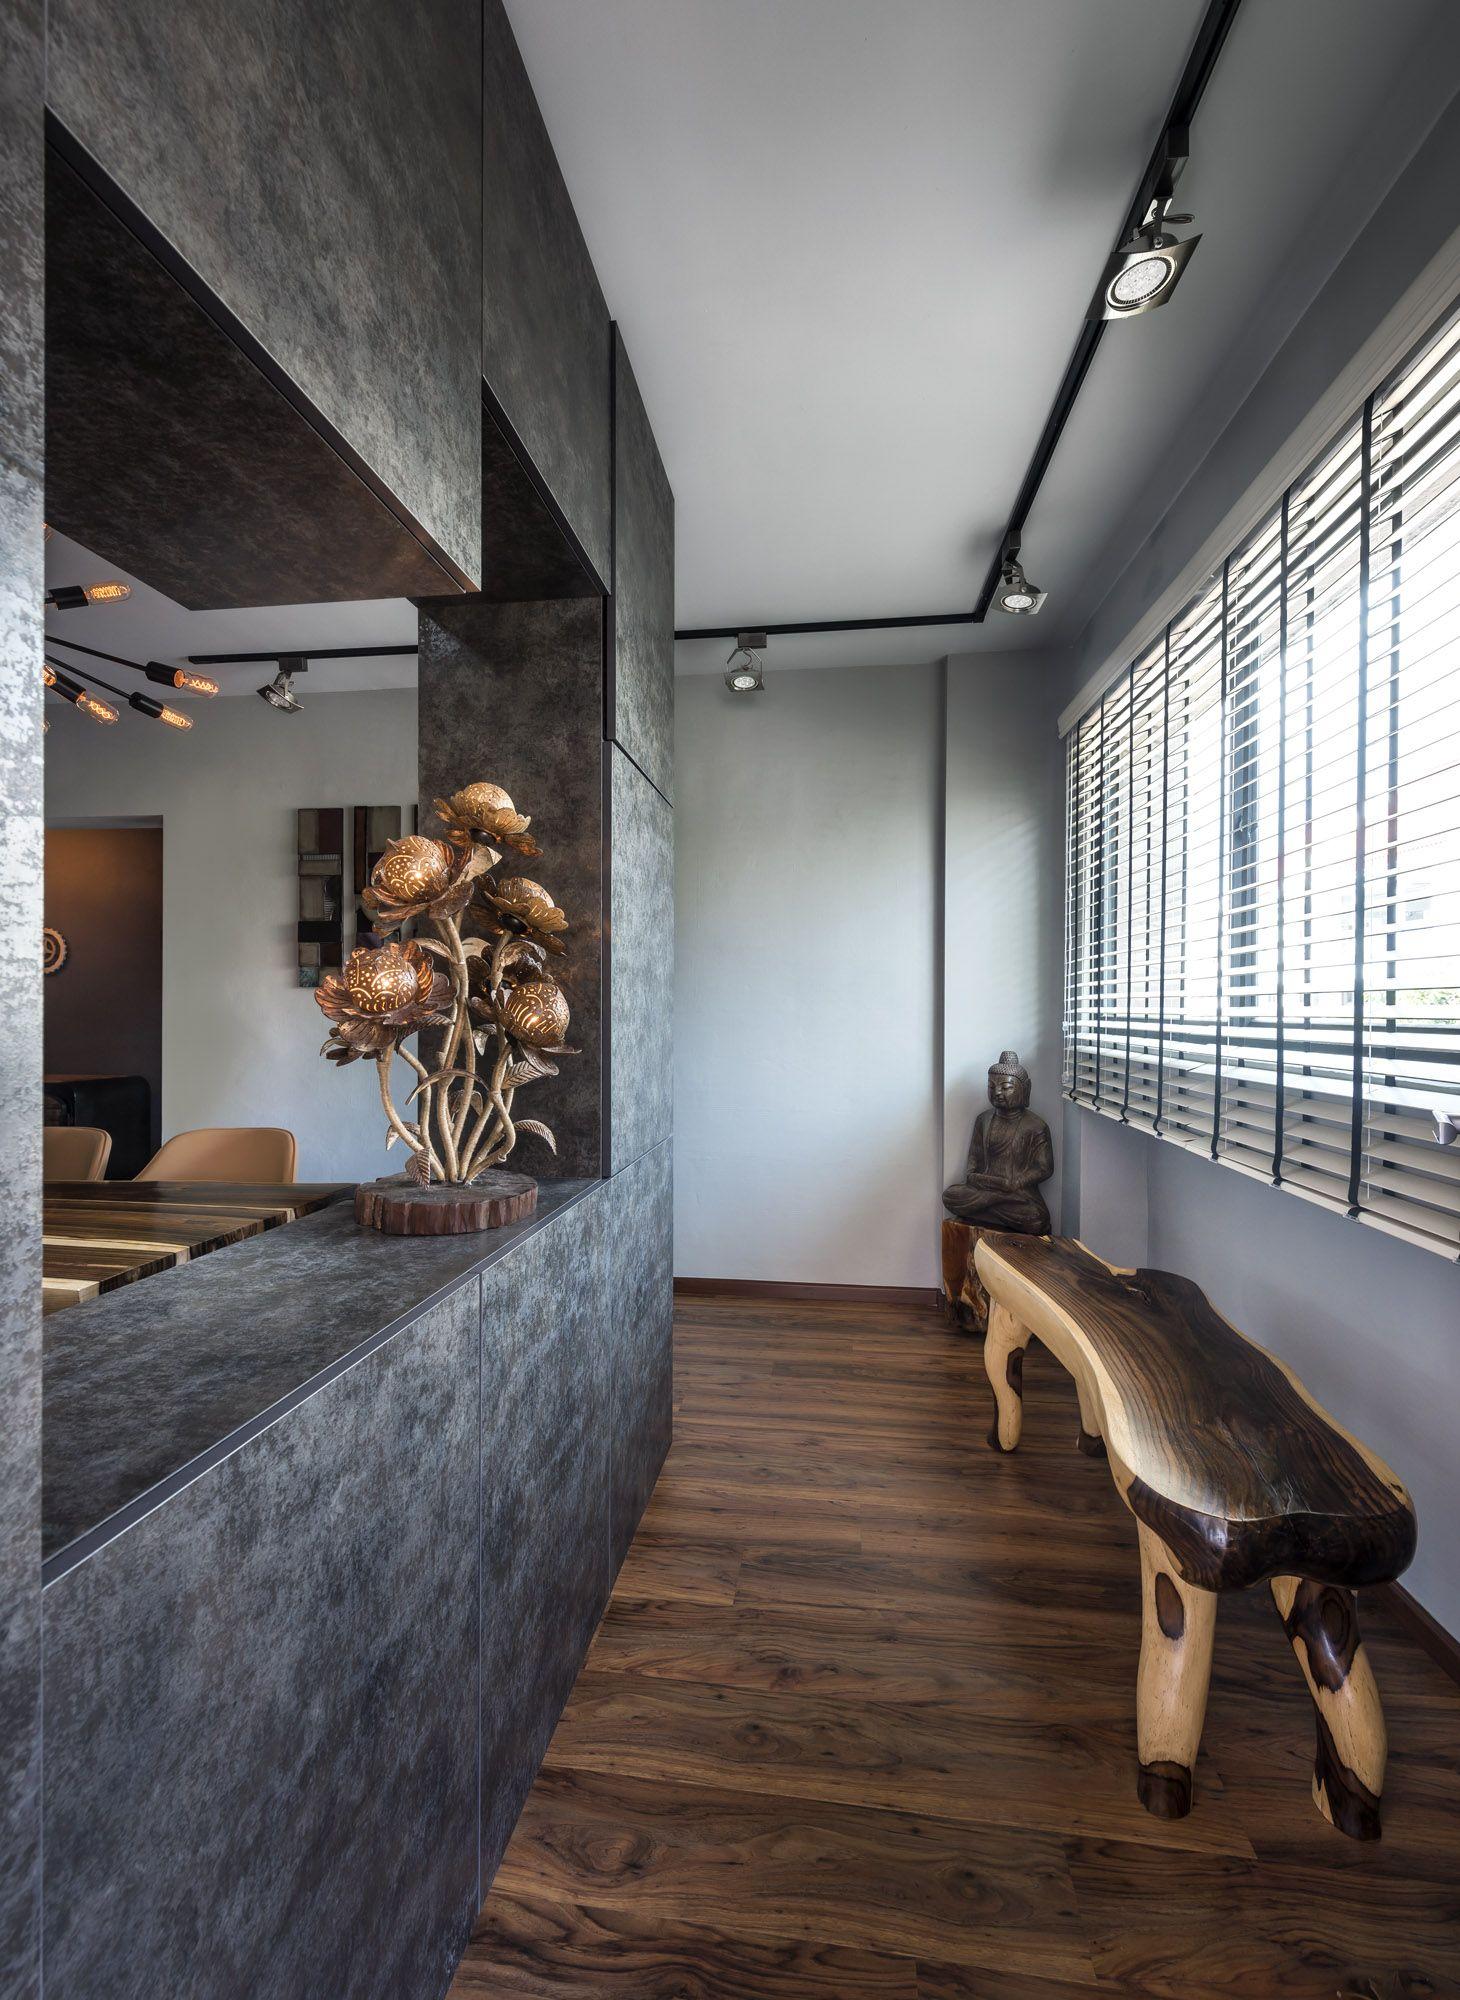 Renovation Ideas For 4a Hdb Living Room: Living Room Goals, Room, Home